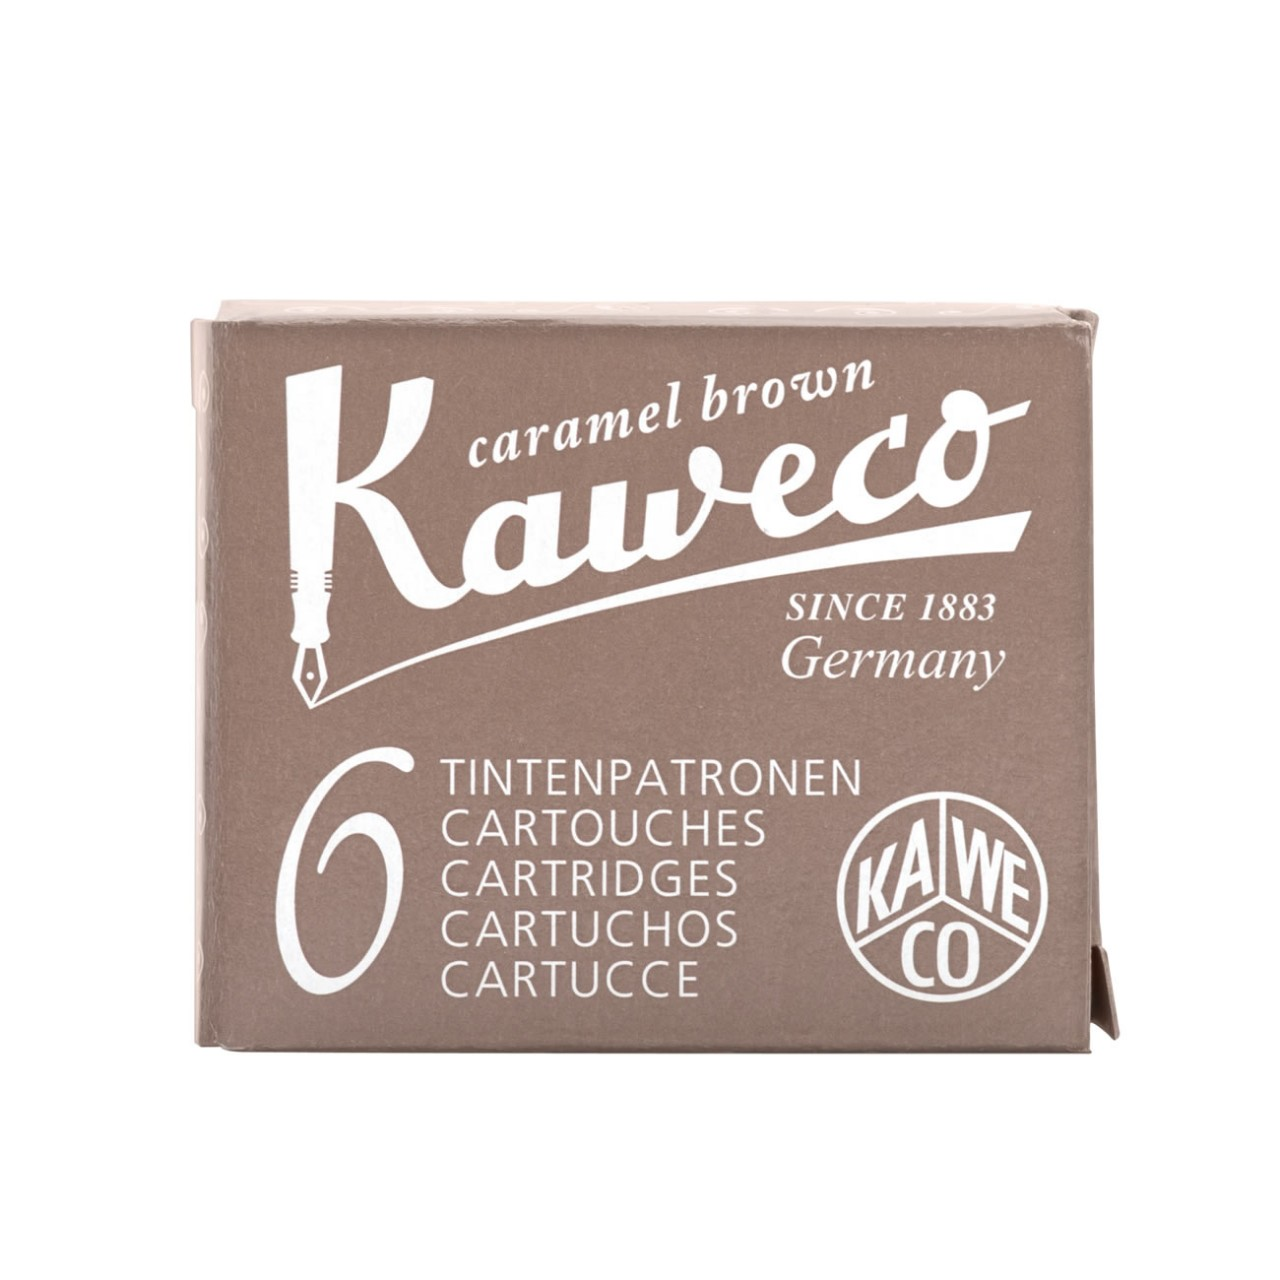 Kaweco Tintenpatronen 6 Stück caramelbraun VE=20 Pack